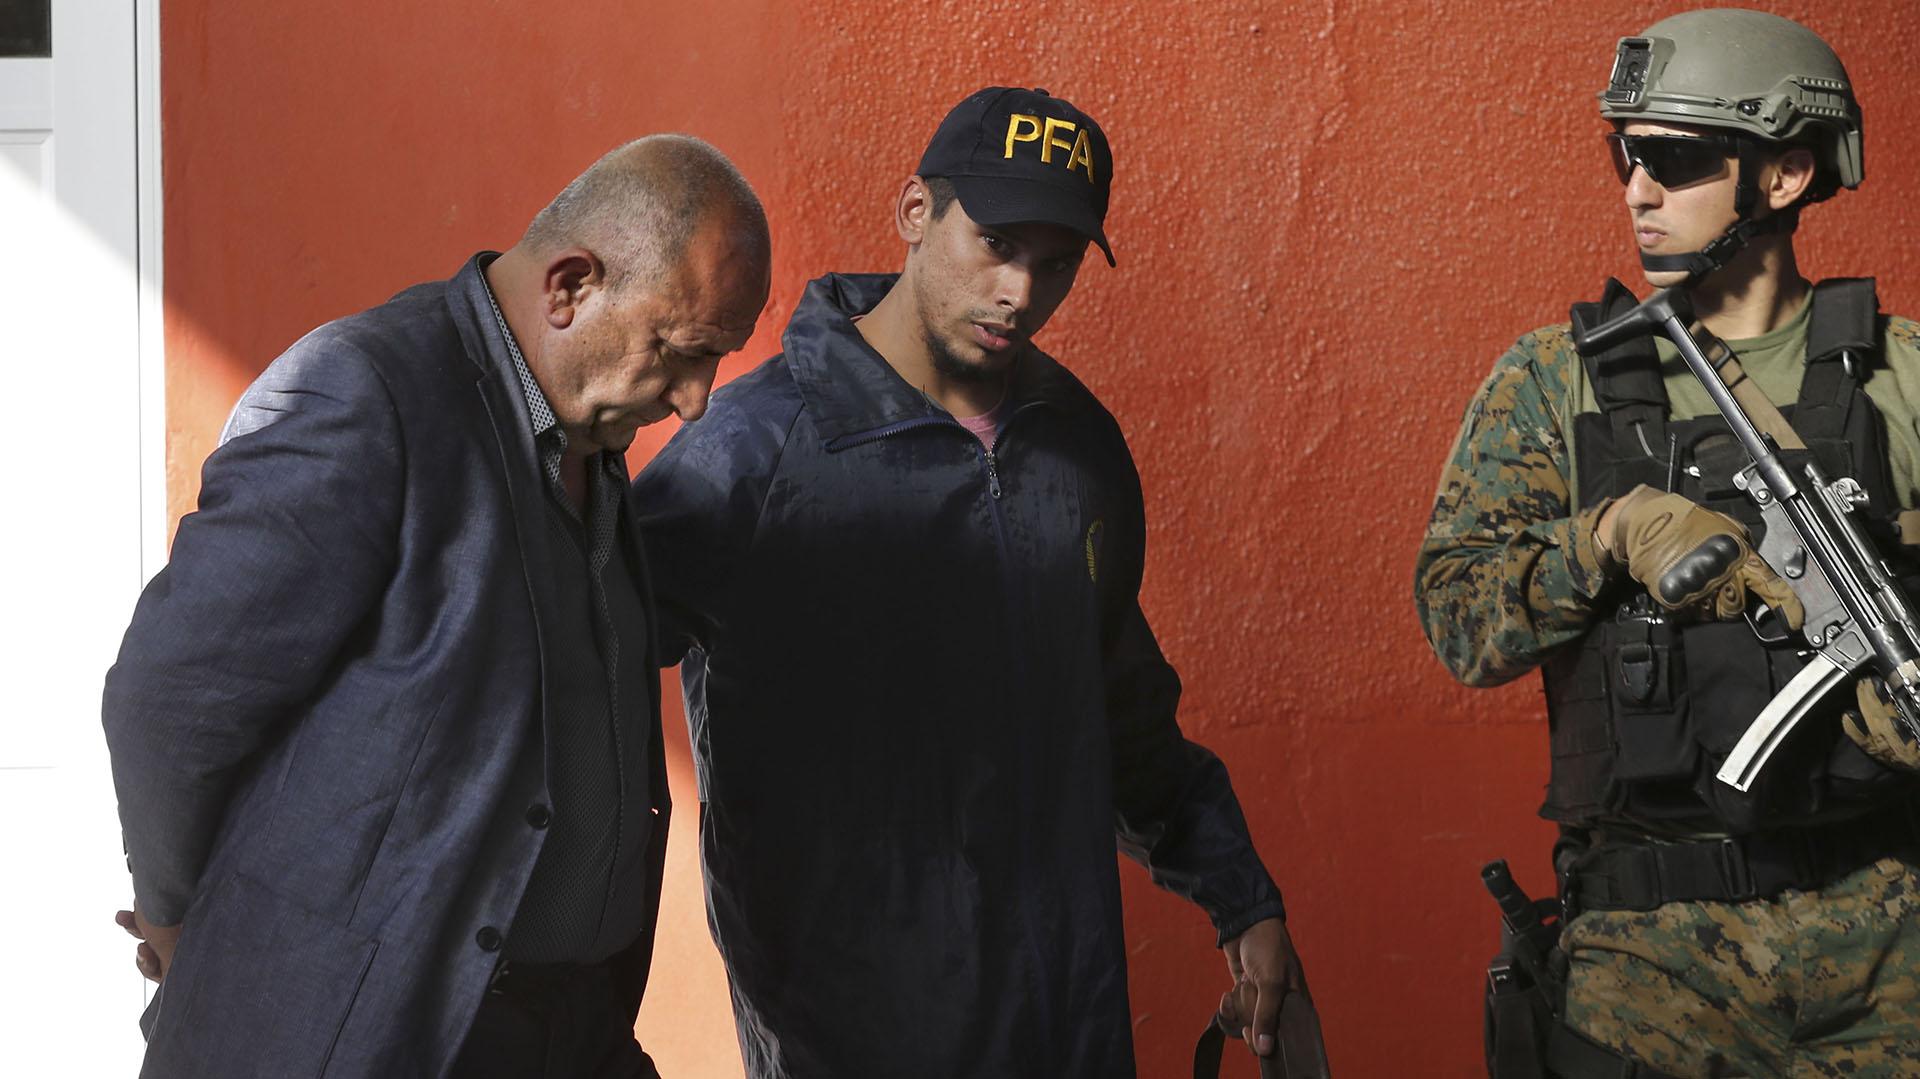 Nakis, en el momento de ser detenido. Foto NA: DAMIAN DOPACIO